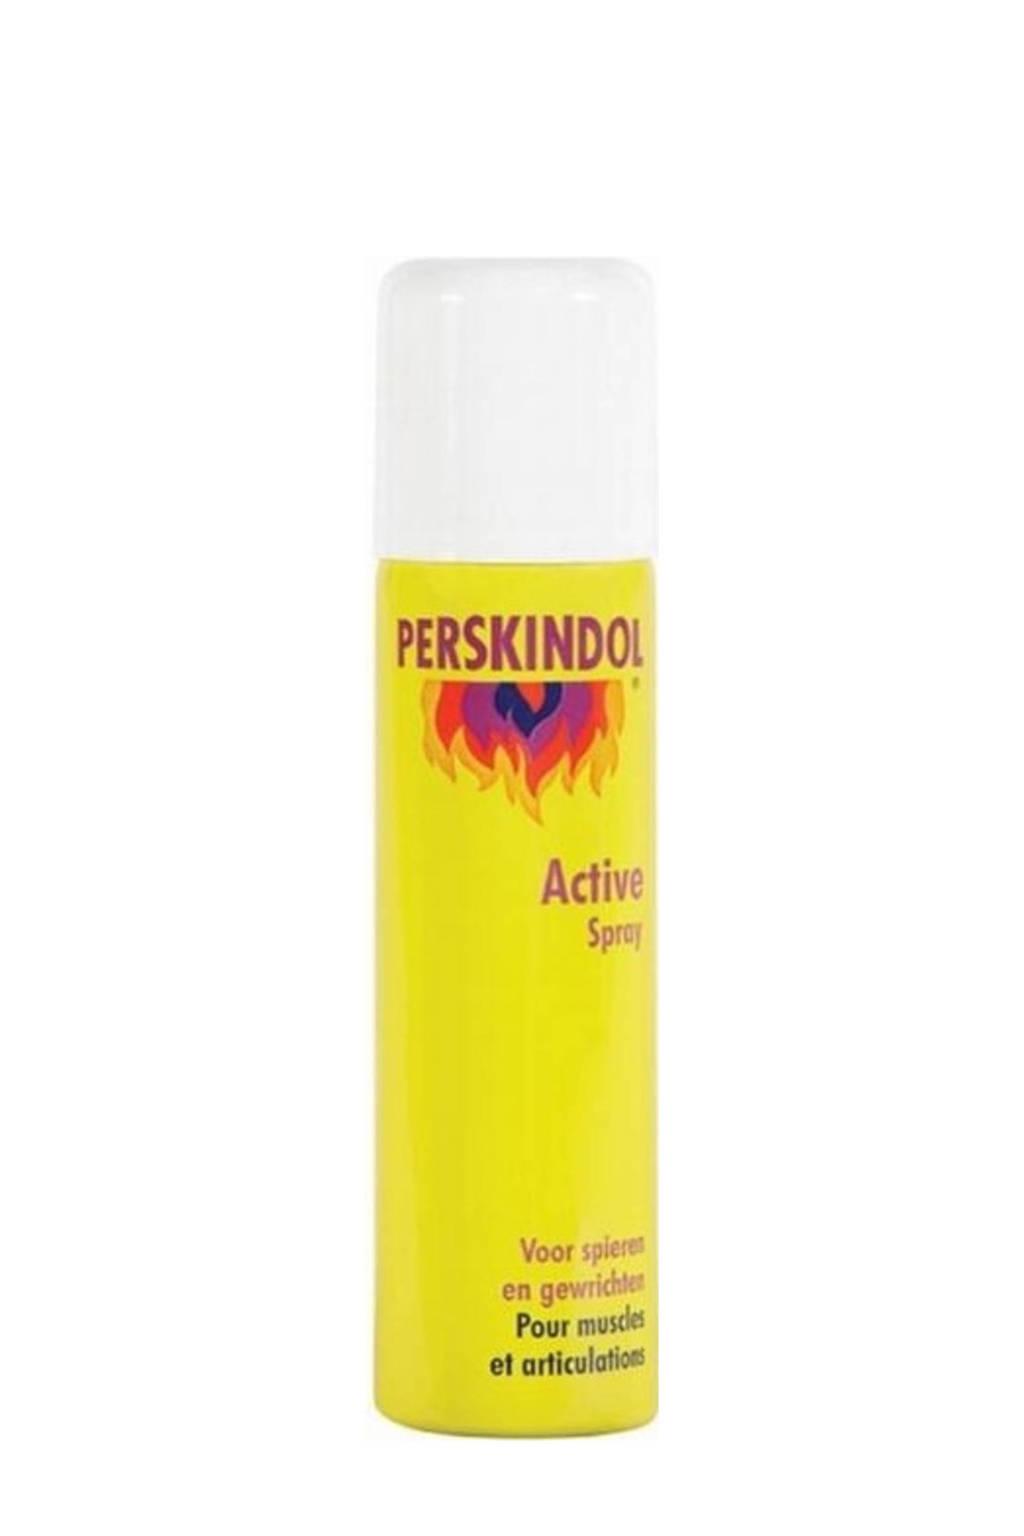 Perskindol Active spray - 150 ml